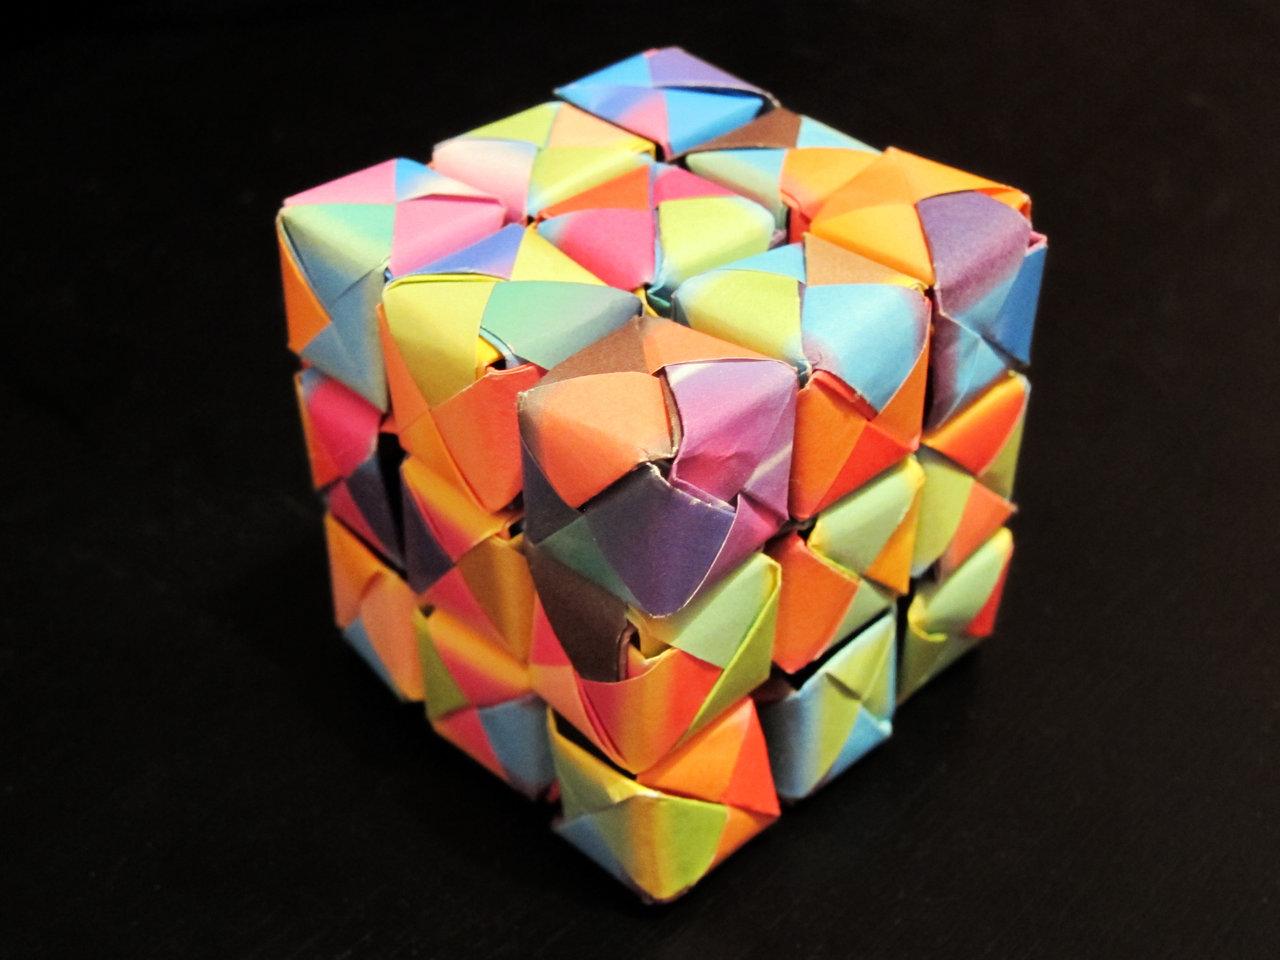 origami l 39 antica tecnica di far vivere la carta youkid. Black Bedroom Furniture Sets. Home Design Ideas